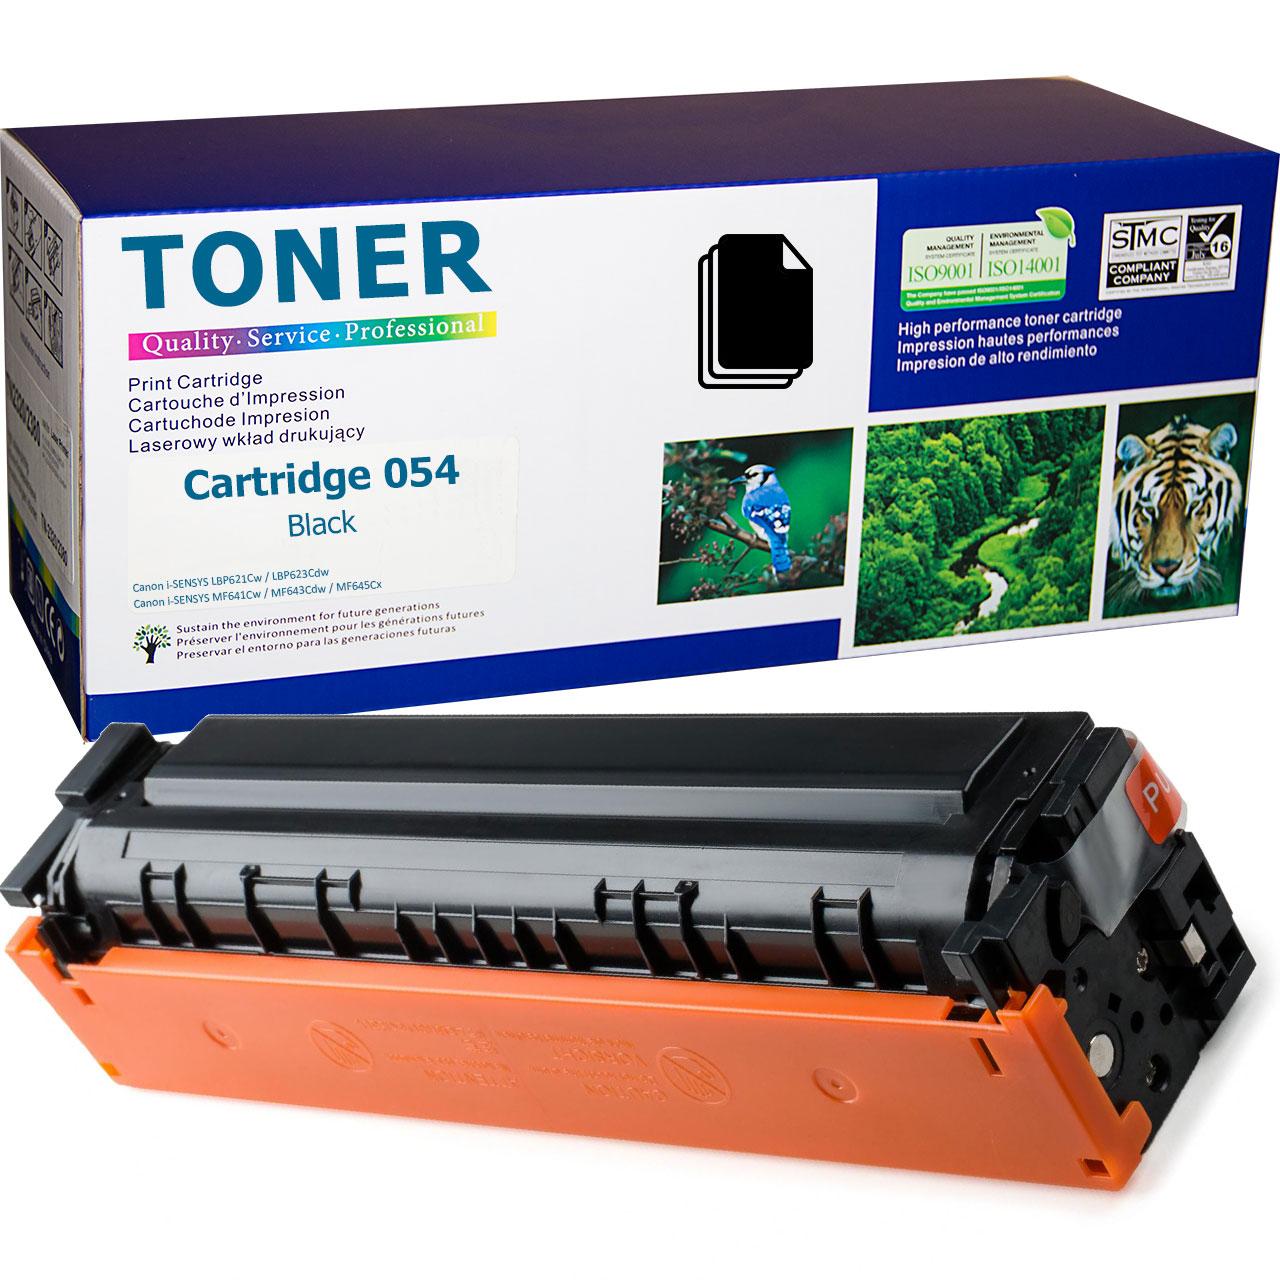 Canon Cartridge 054 Black Toner Cartridge